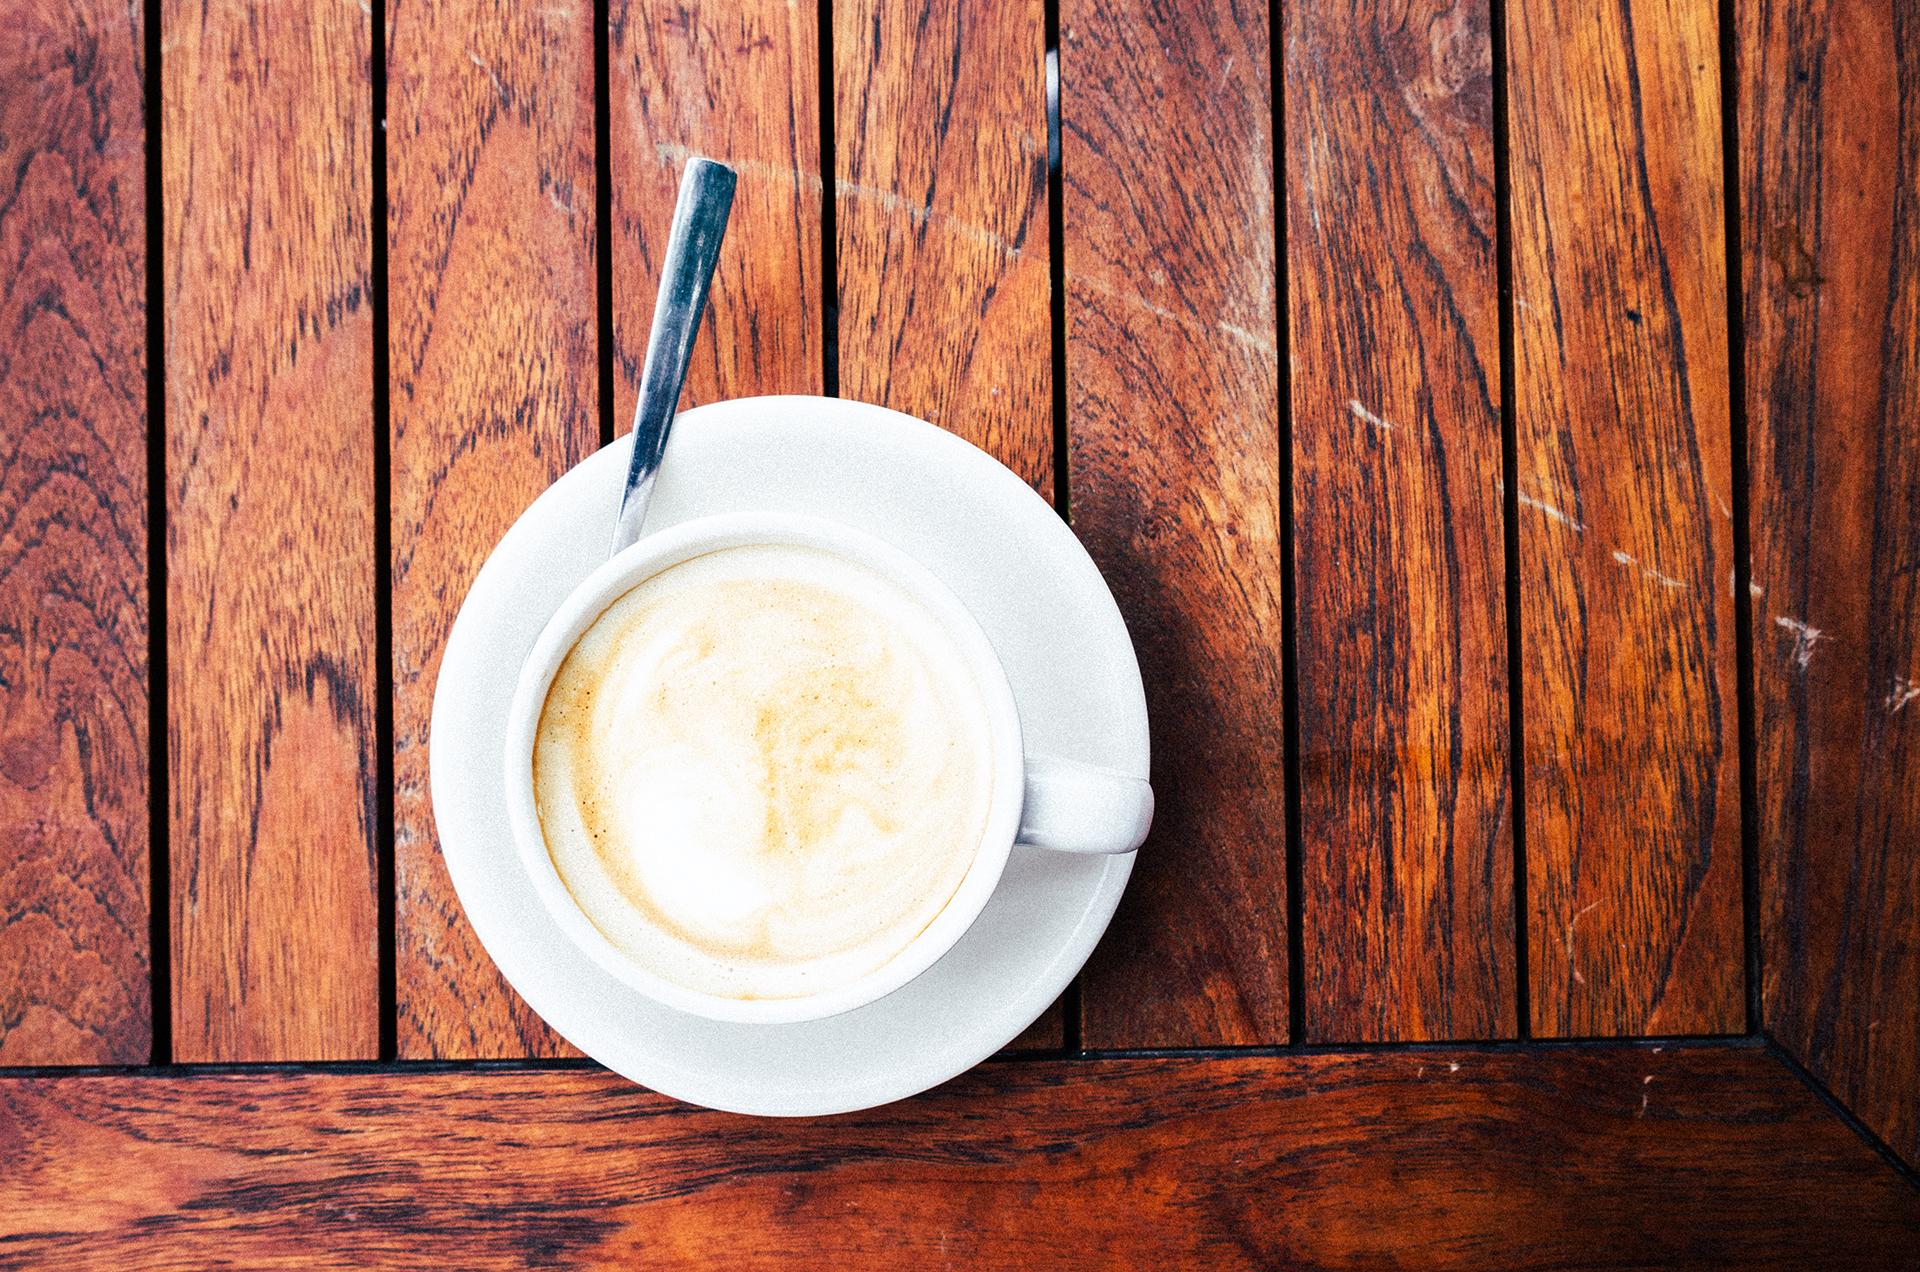 Kaffeemaschine Kaffeeautomat 12 Tassen 900 Watt braun aztec Glaskanne NEU*18662 Bild 2